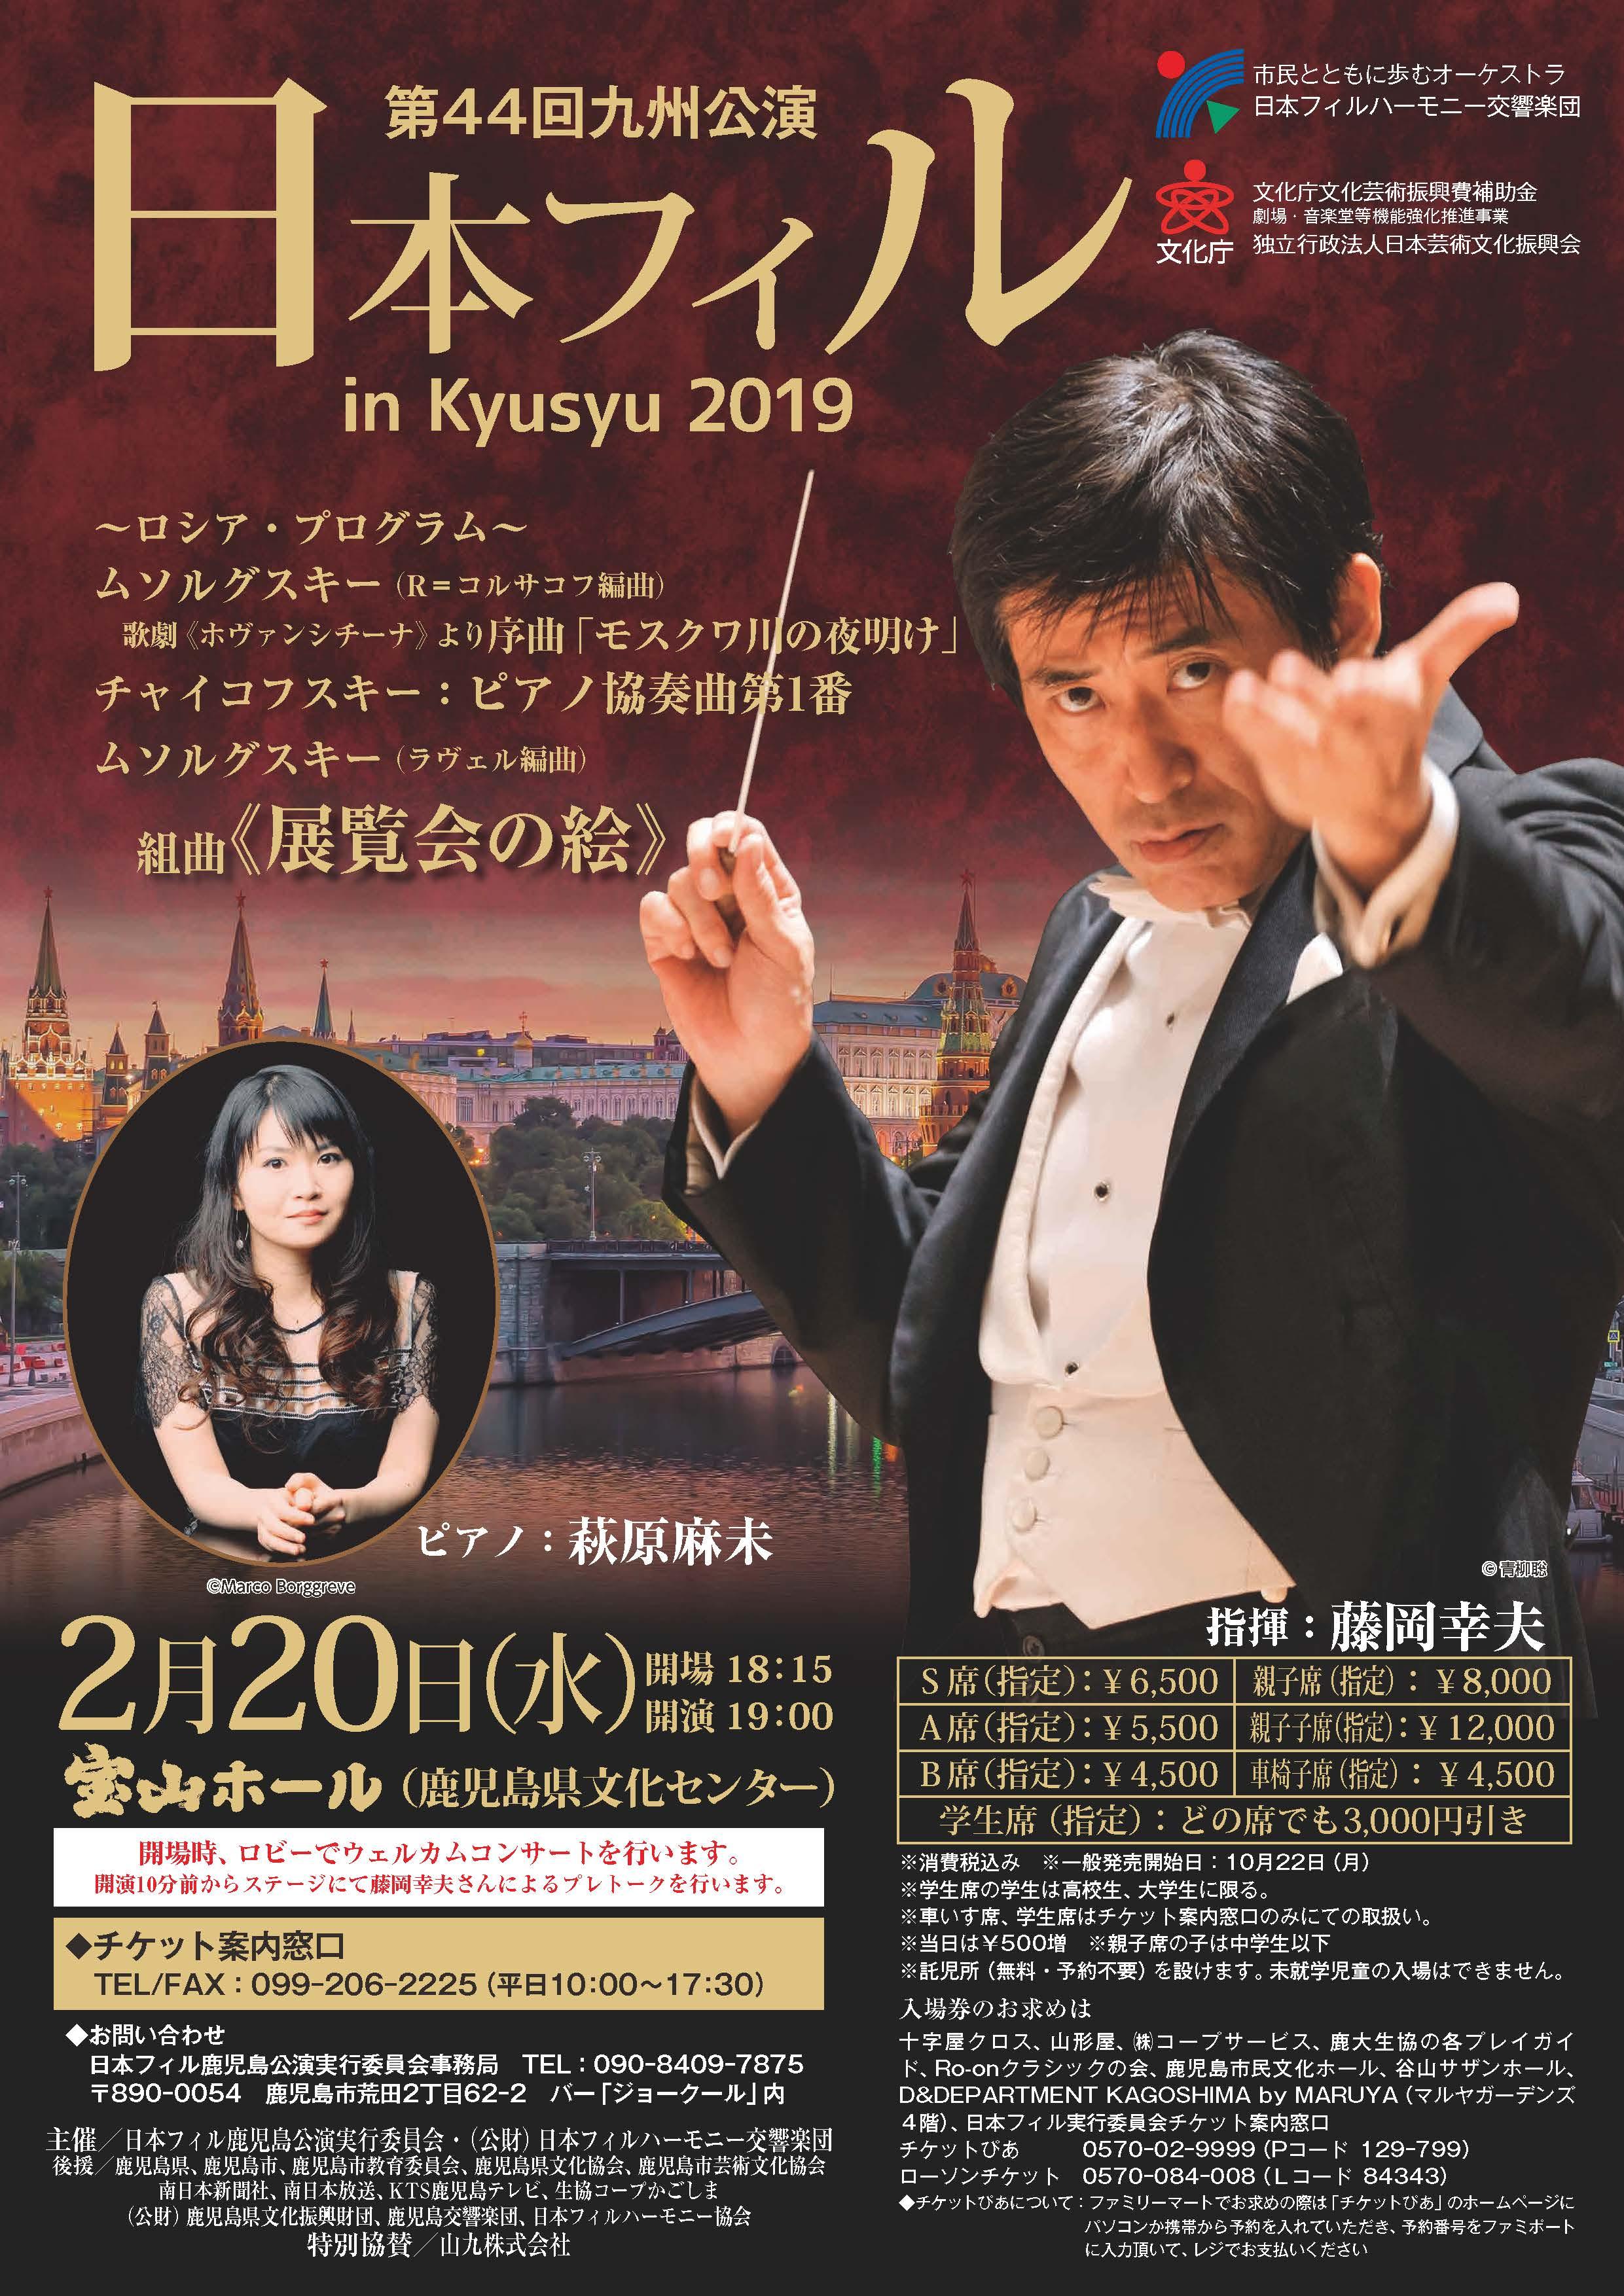 第44回九州公演 日本フィル in kyusyu2019 鹿児島公演